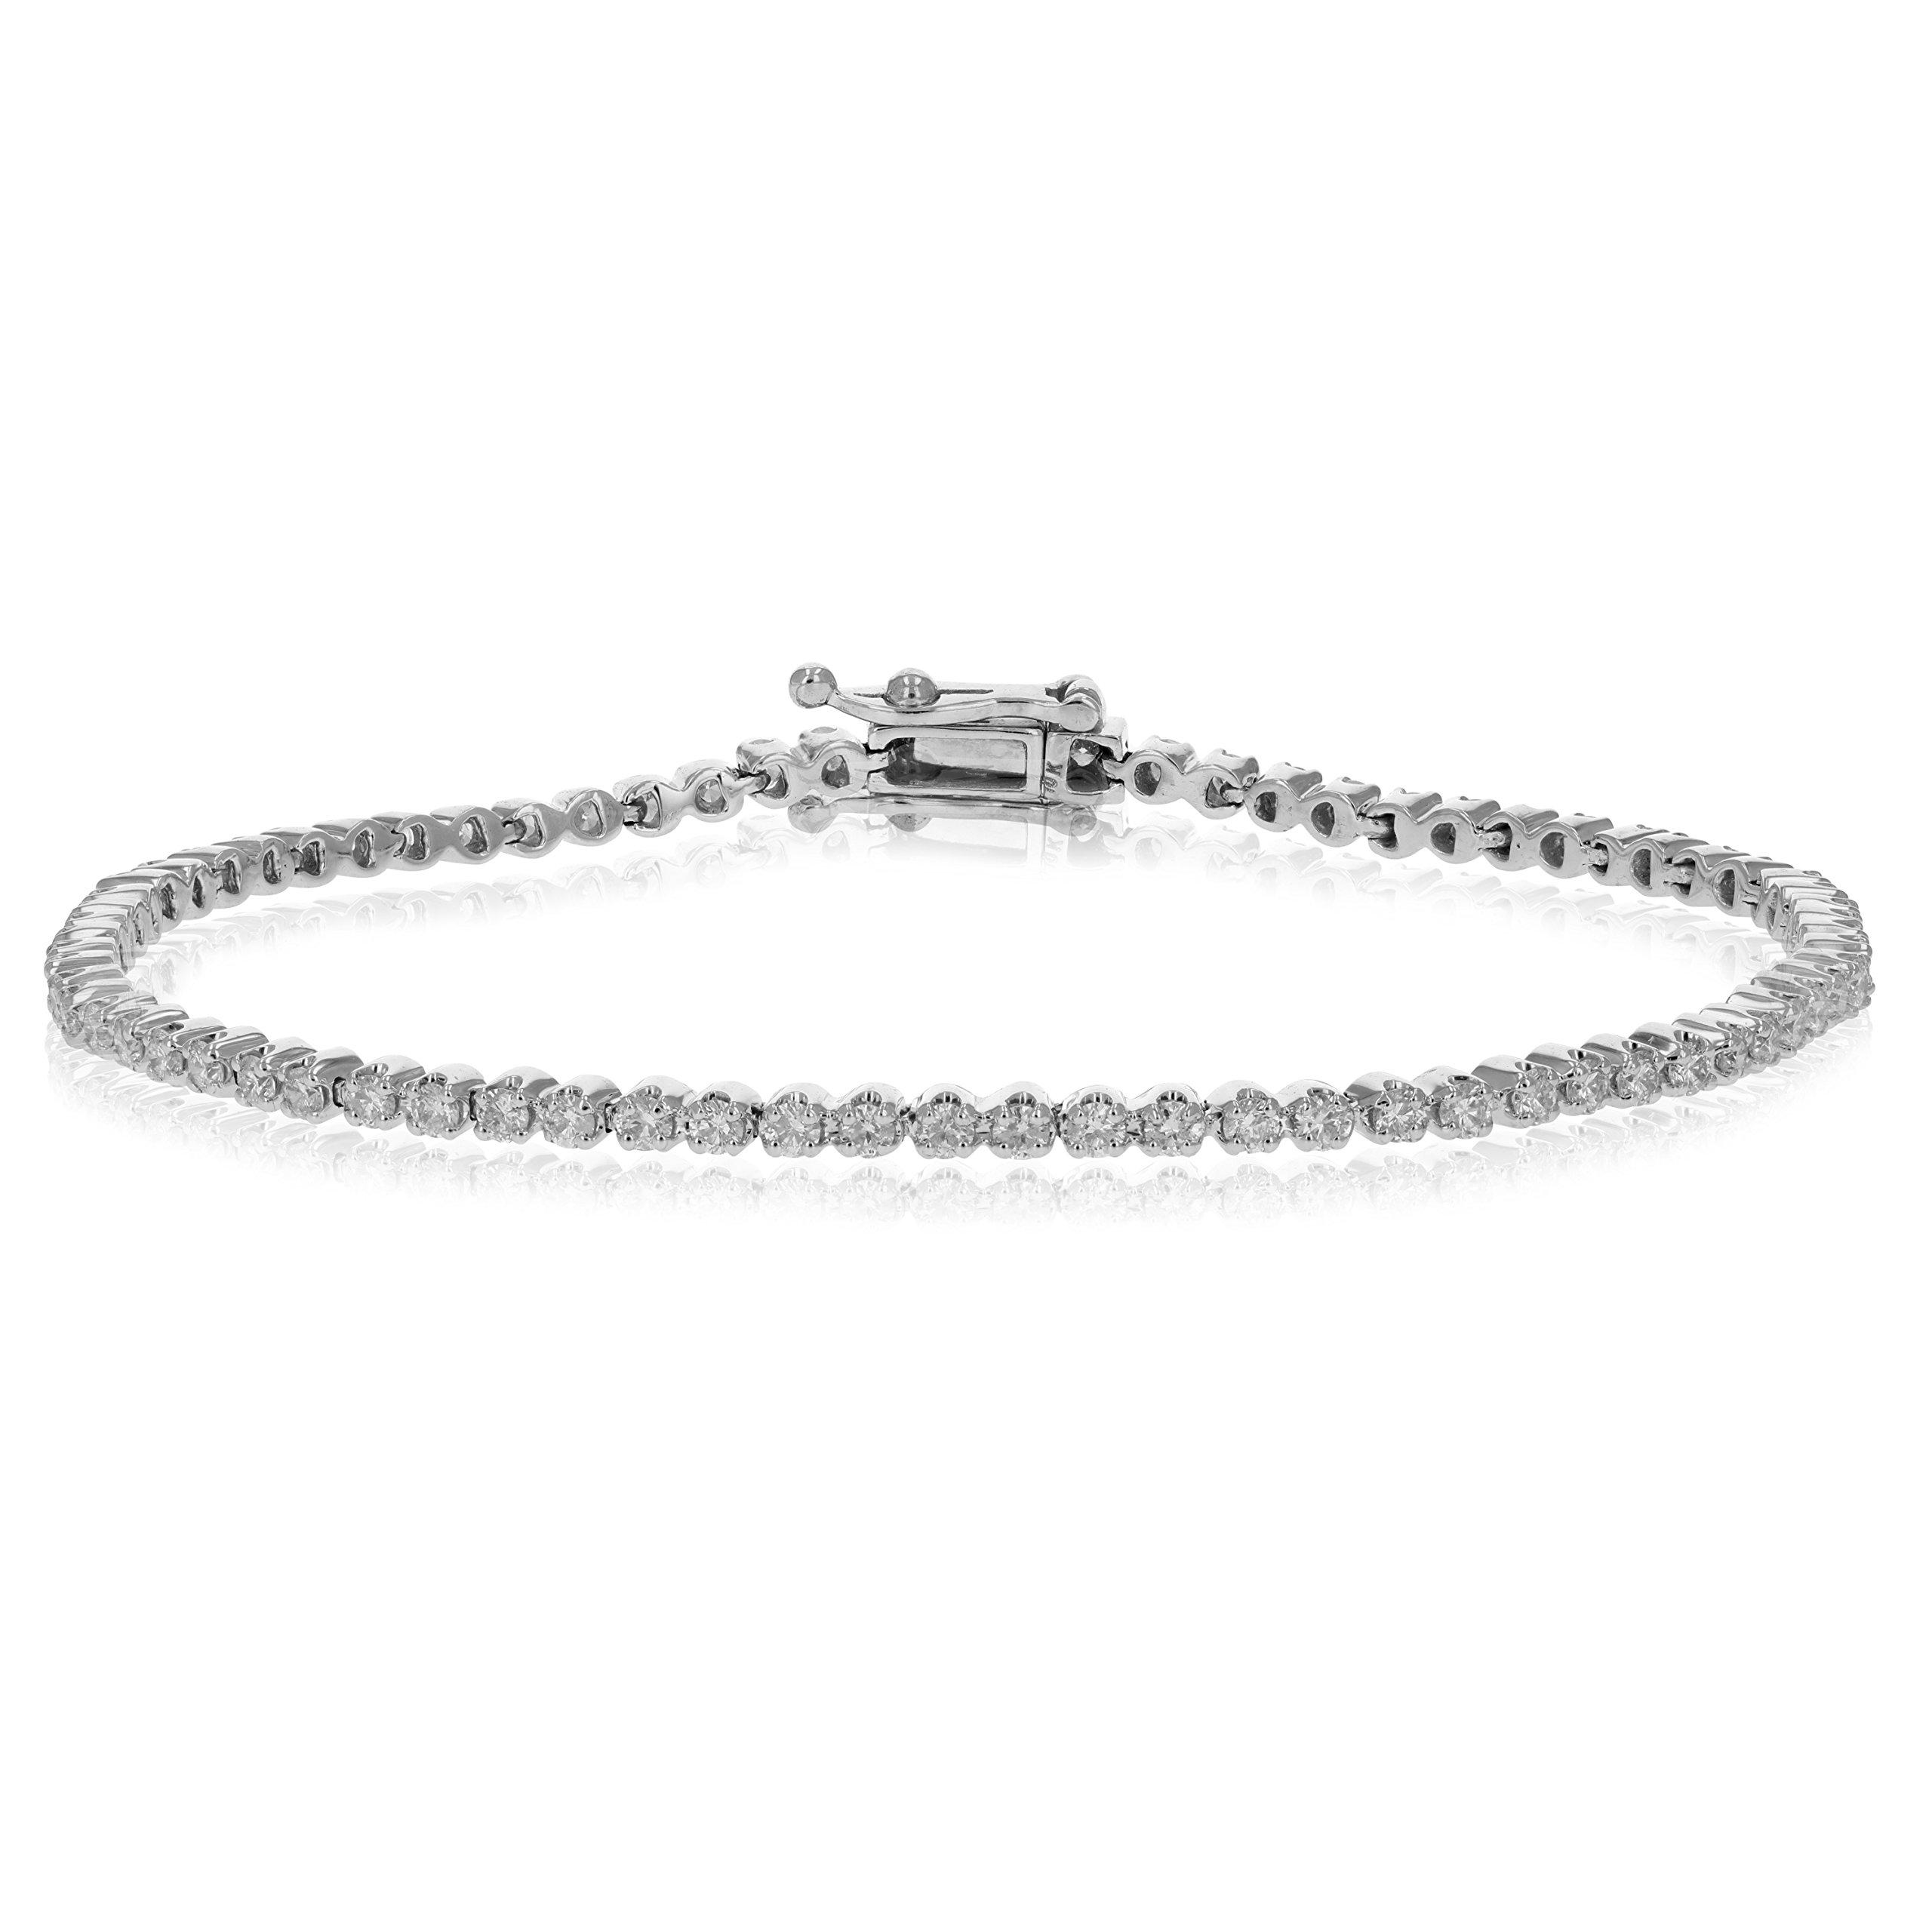 2 CT Diamond Tennis Bracelet in 10K Gold